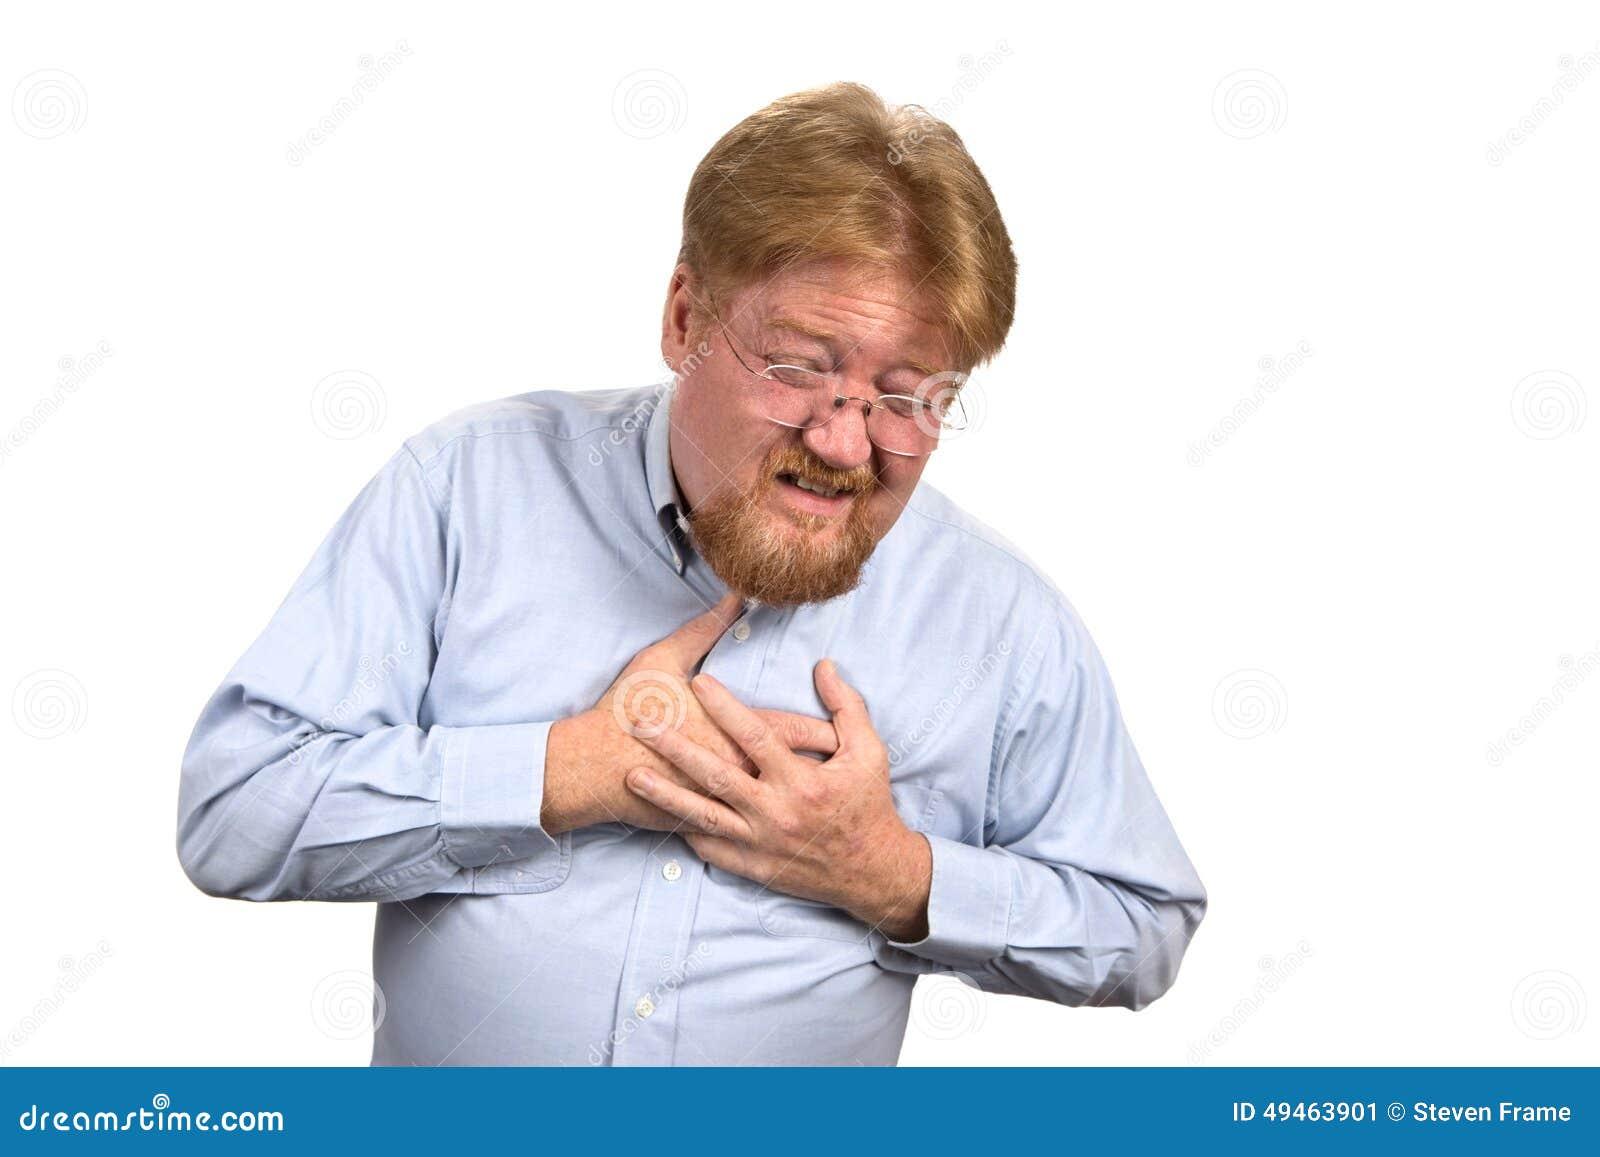 man having heart attack stock image. image of beard, expression